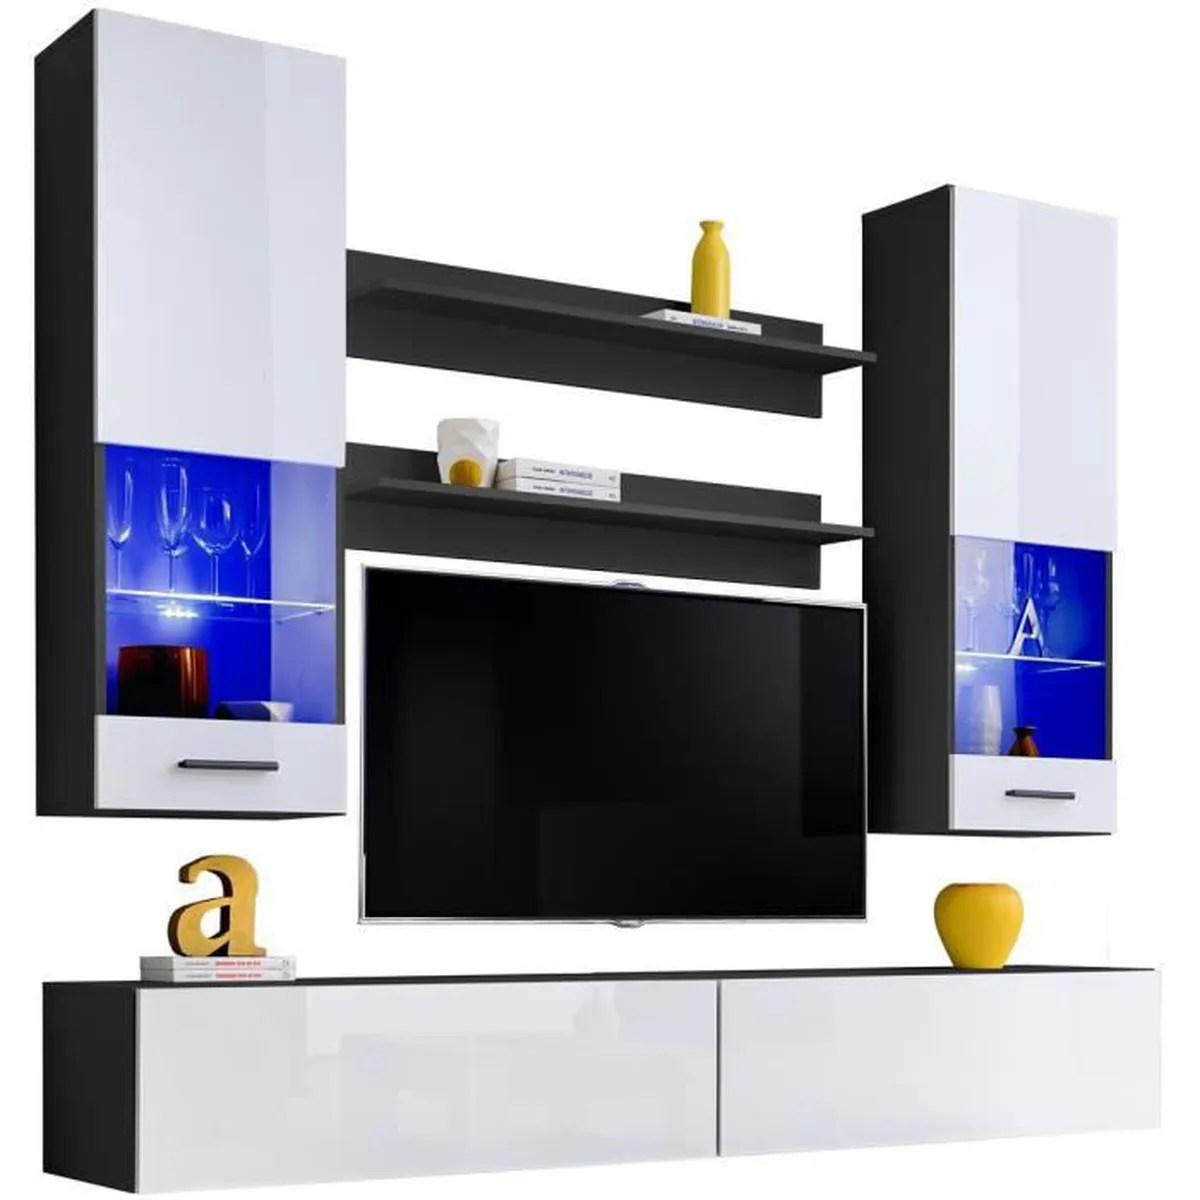 https www cdiscount com maison meubles mobilier extreme furniture meuble tv mural fly led bleues f 11760010502 auc2008561858601 html